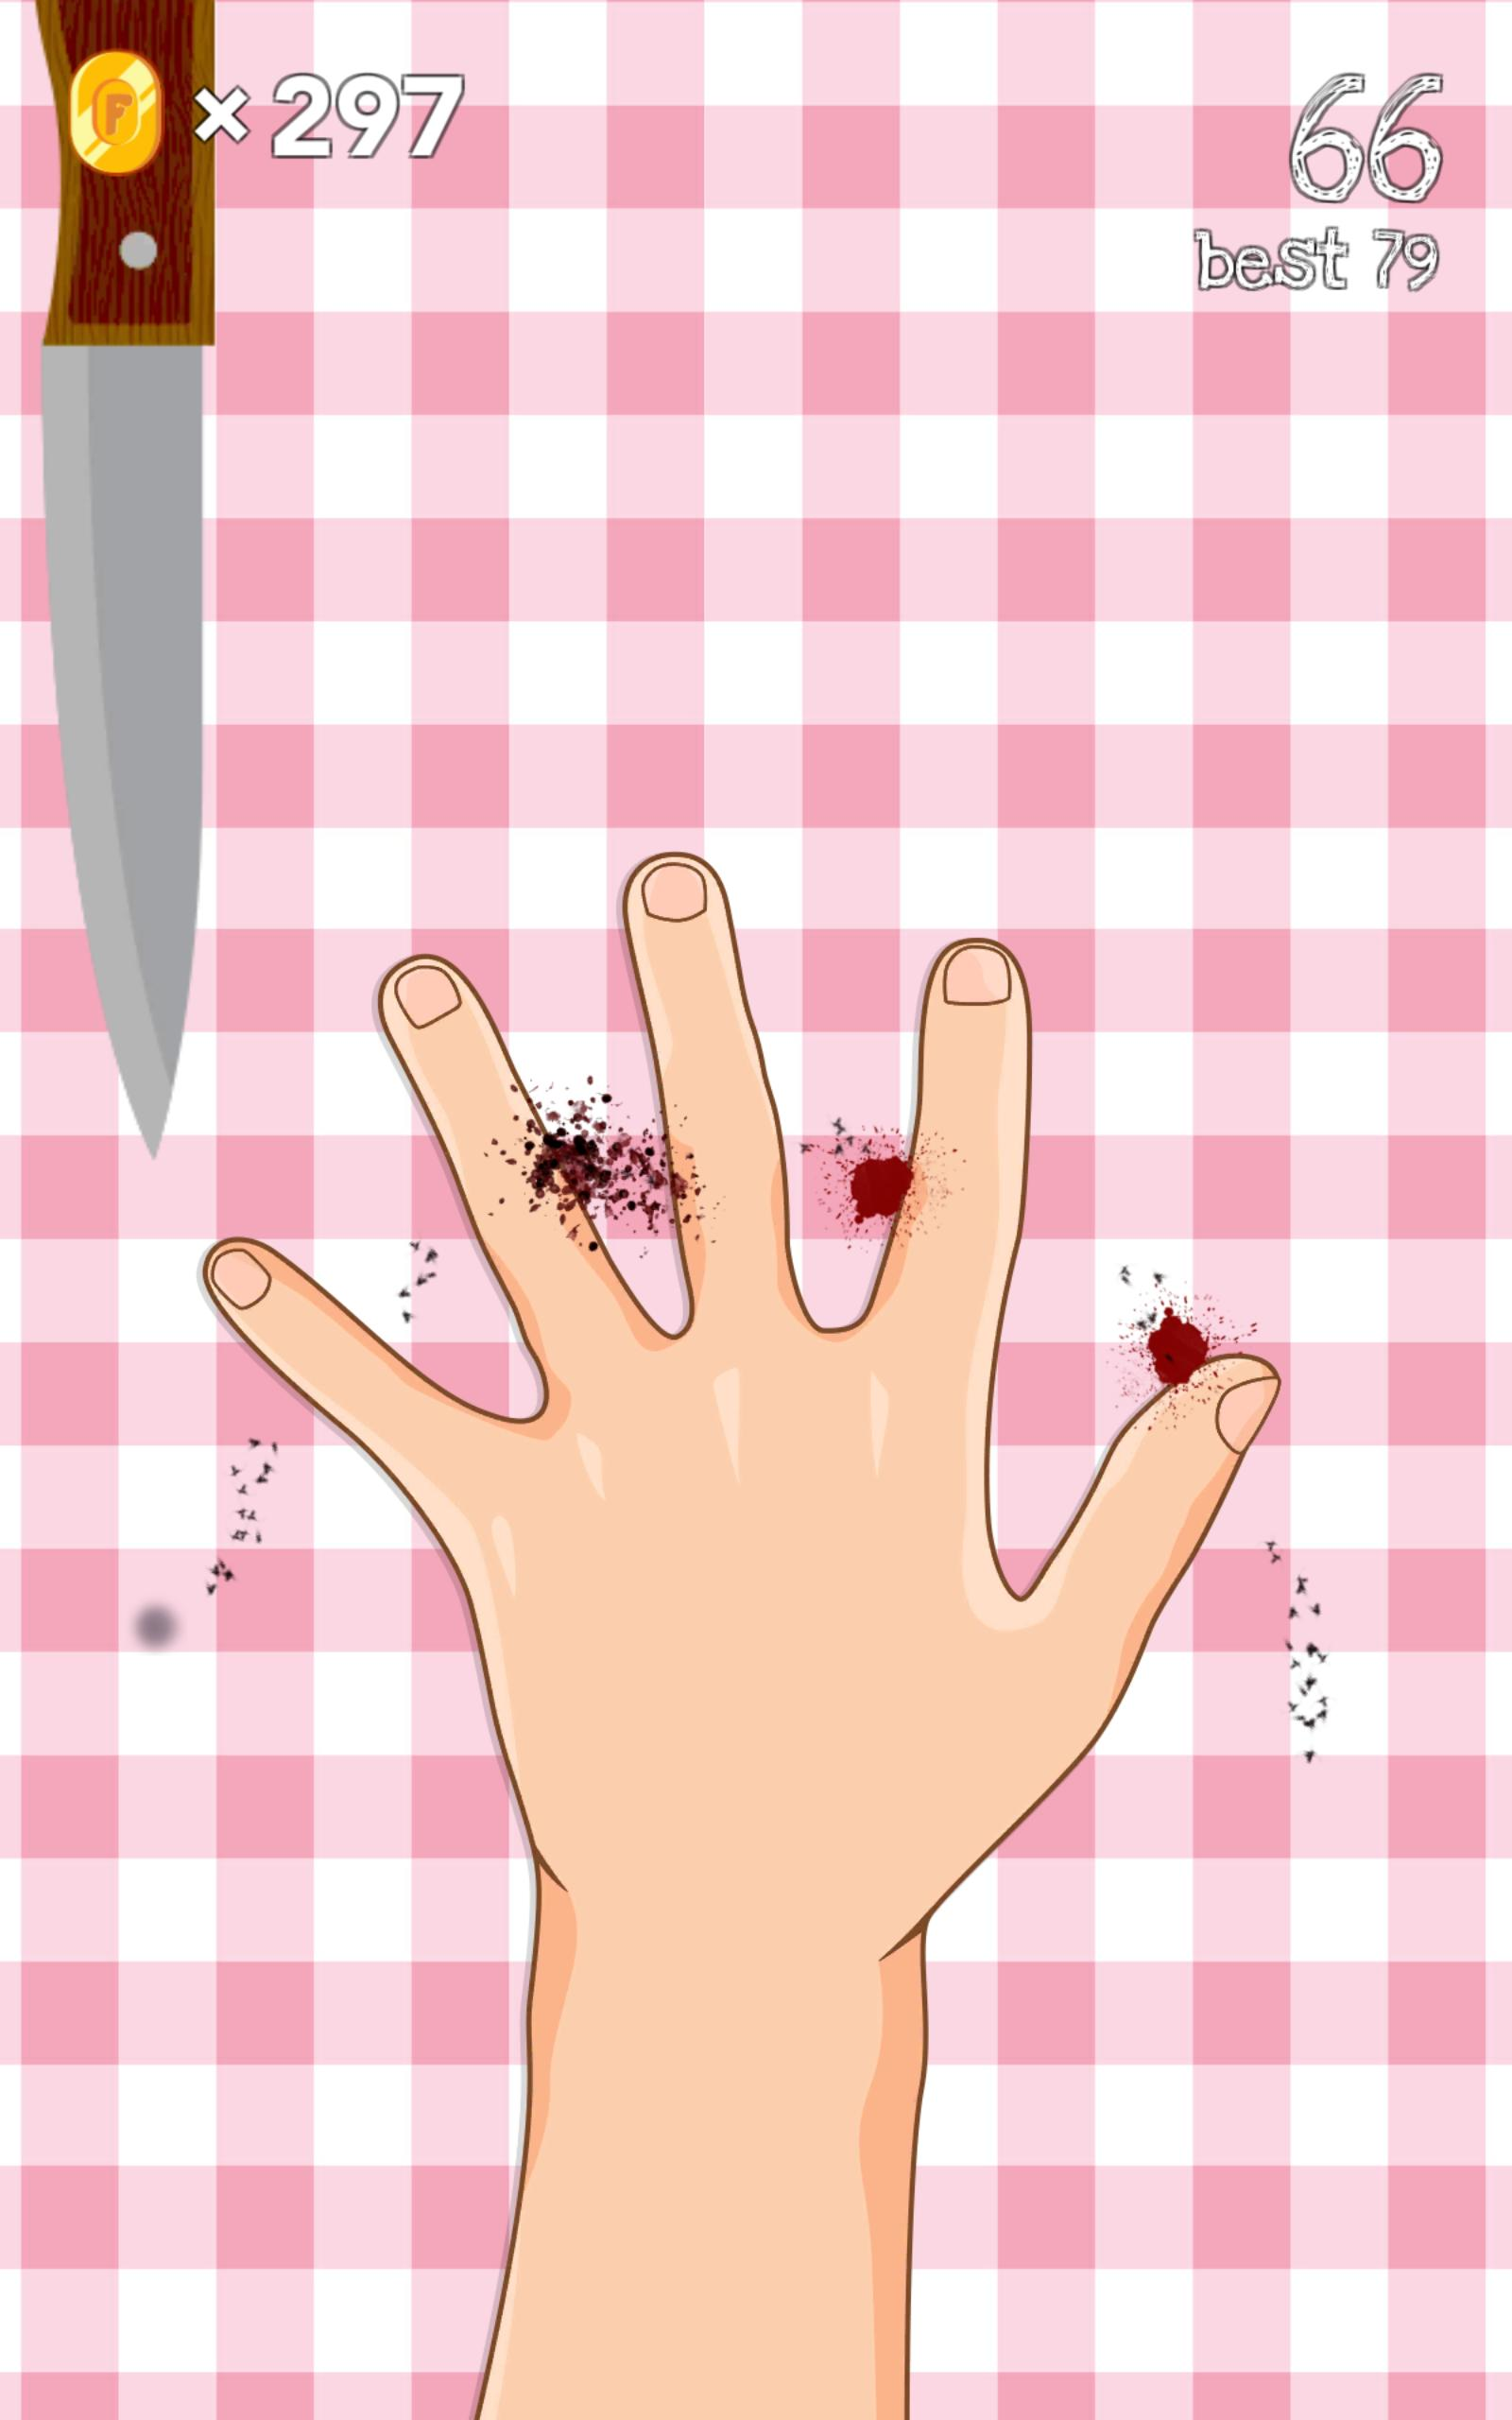 4 Fingers - free knife games 3.4 Screenshot 4